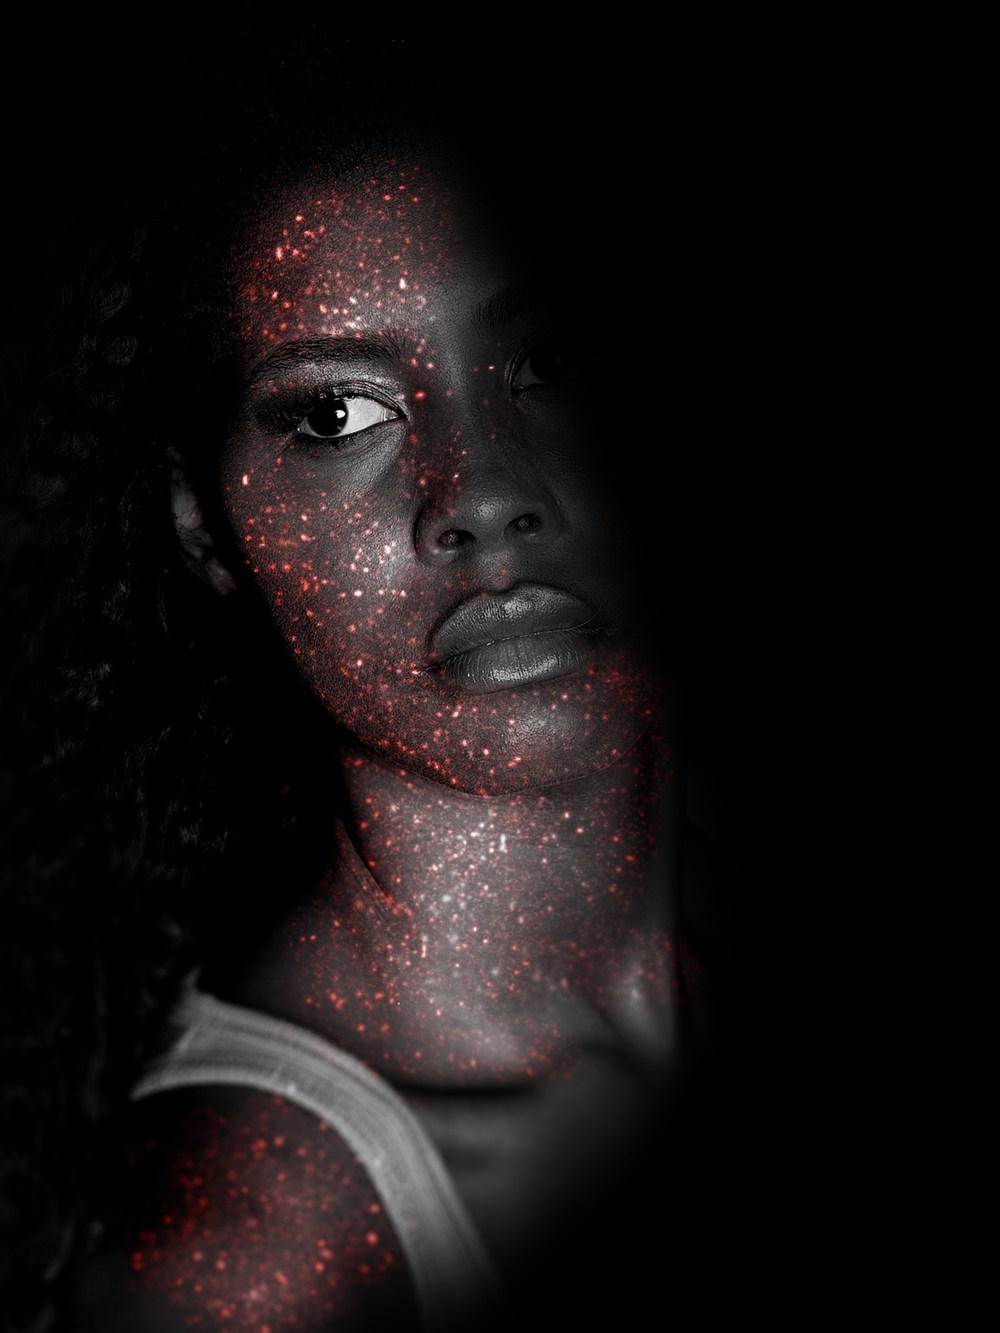 A woman wearing face glitter